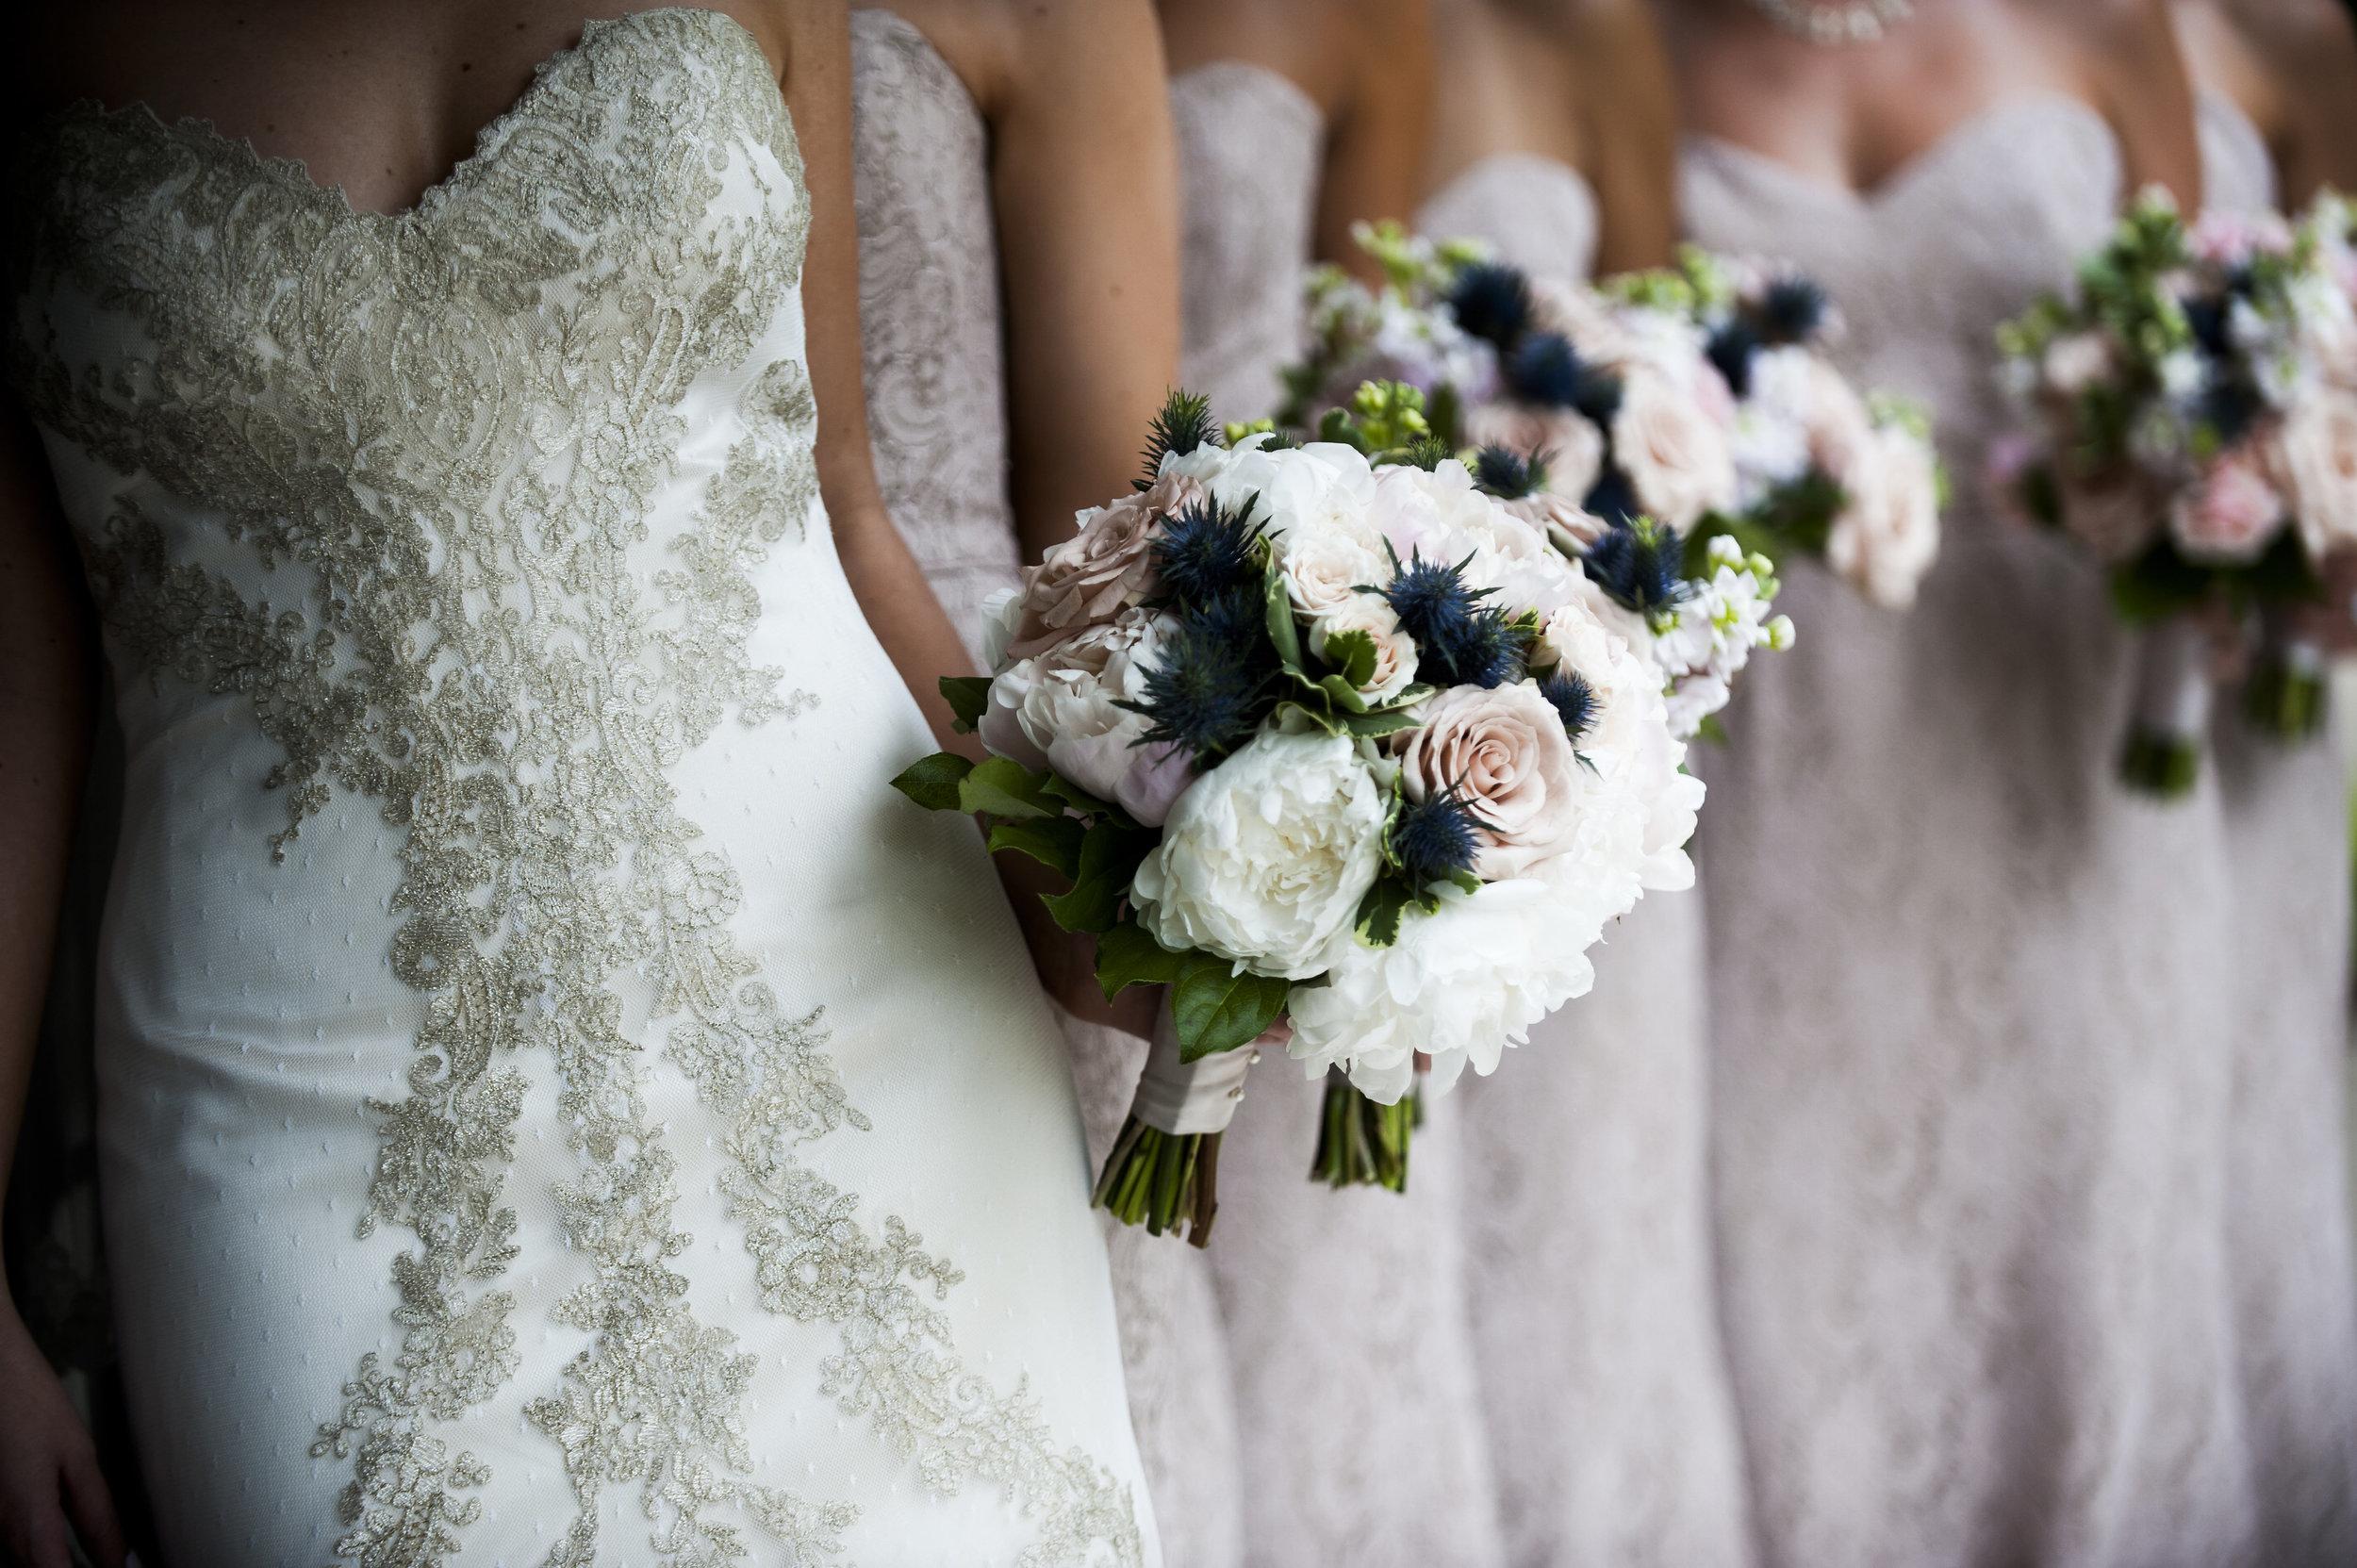 Outdoor Wedding bouquets